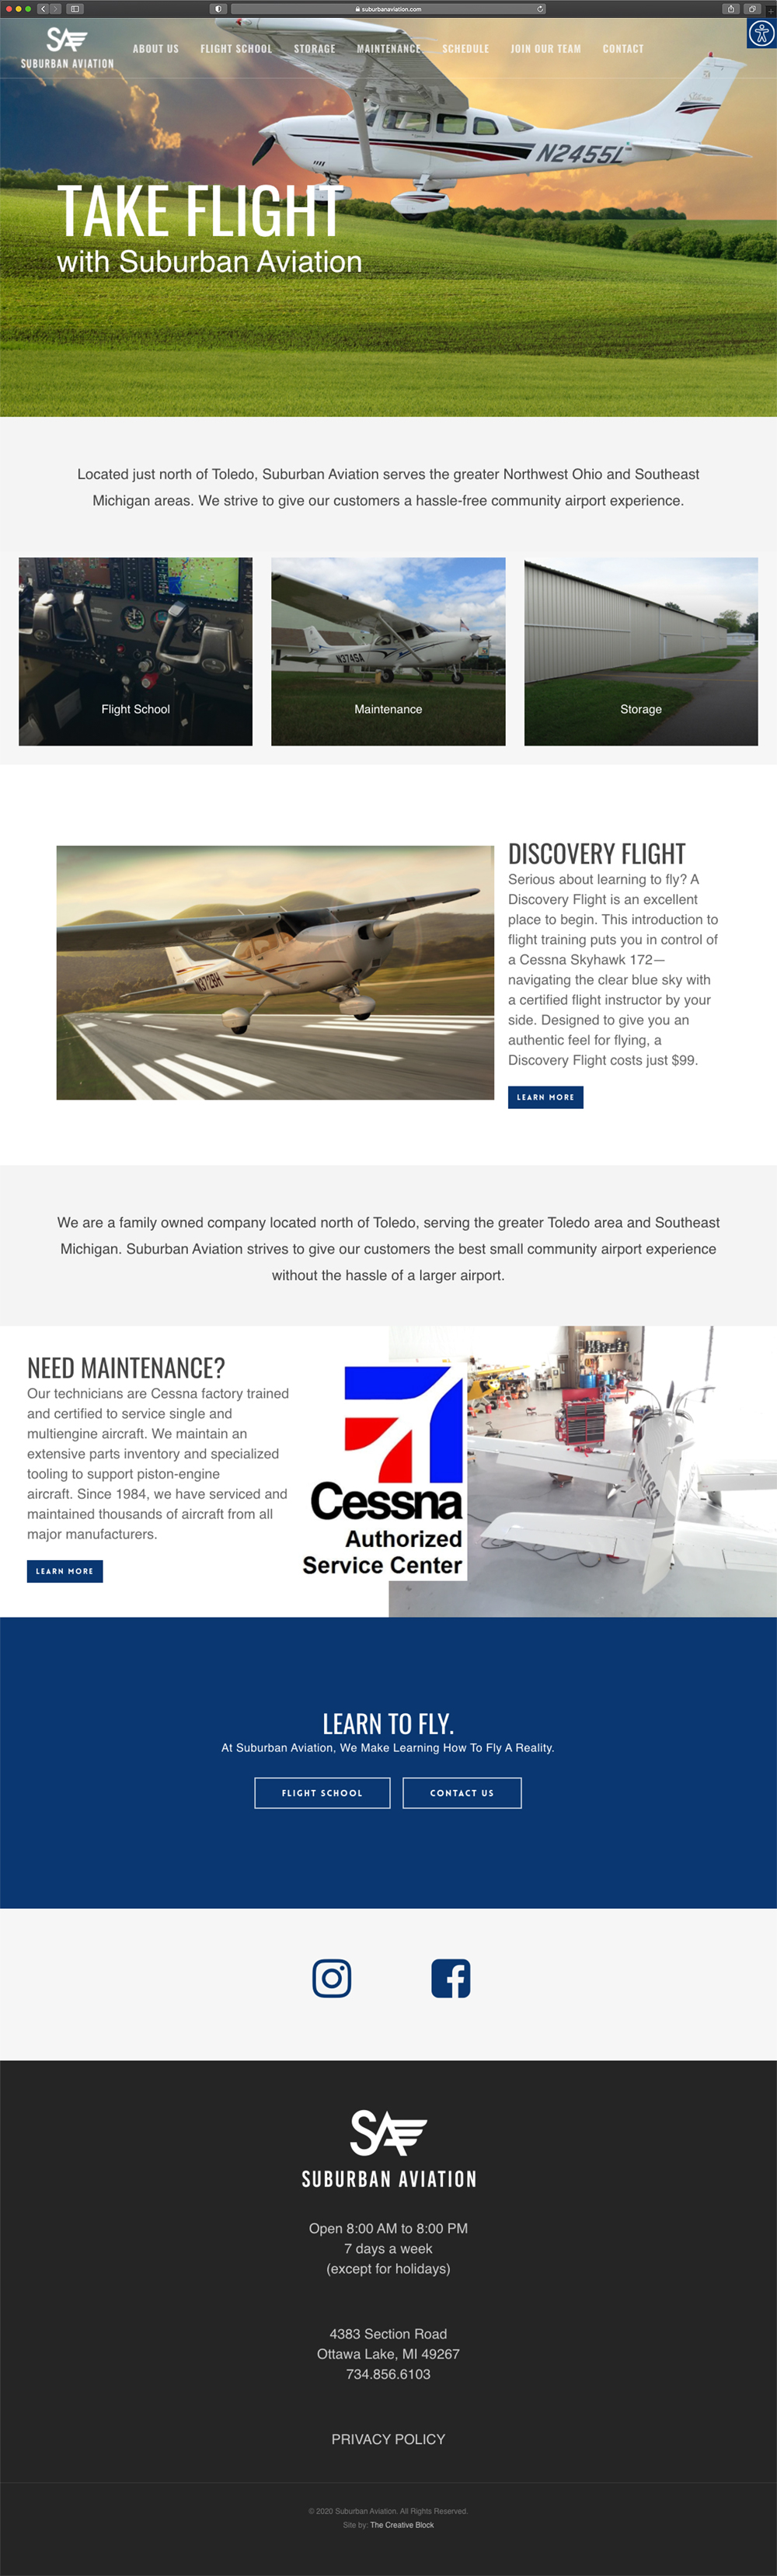 Suburban Aviation - Homepage